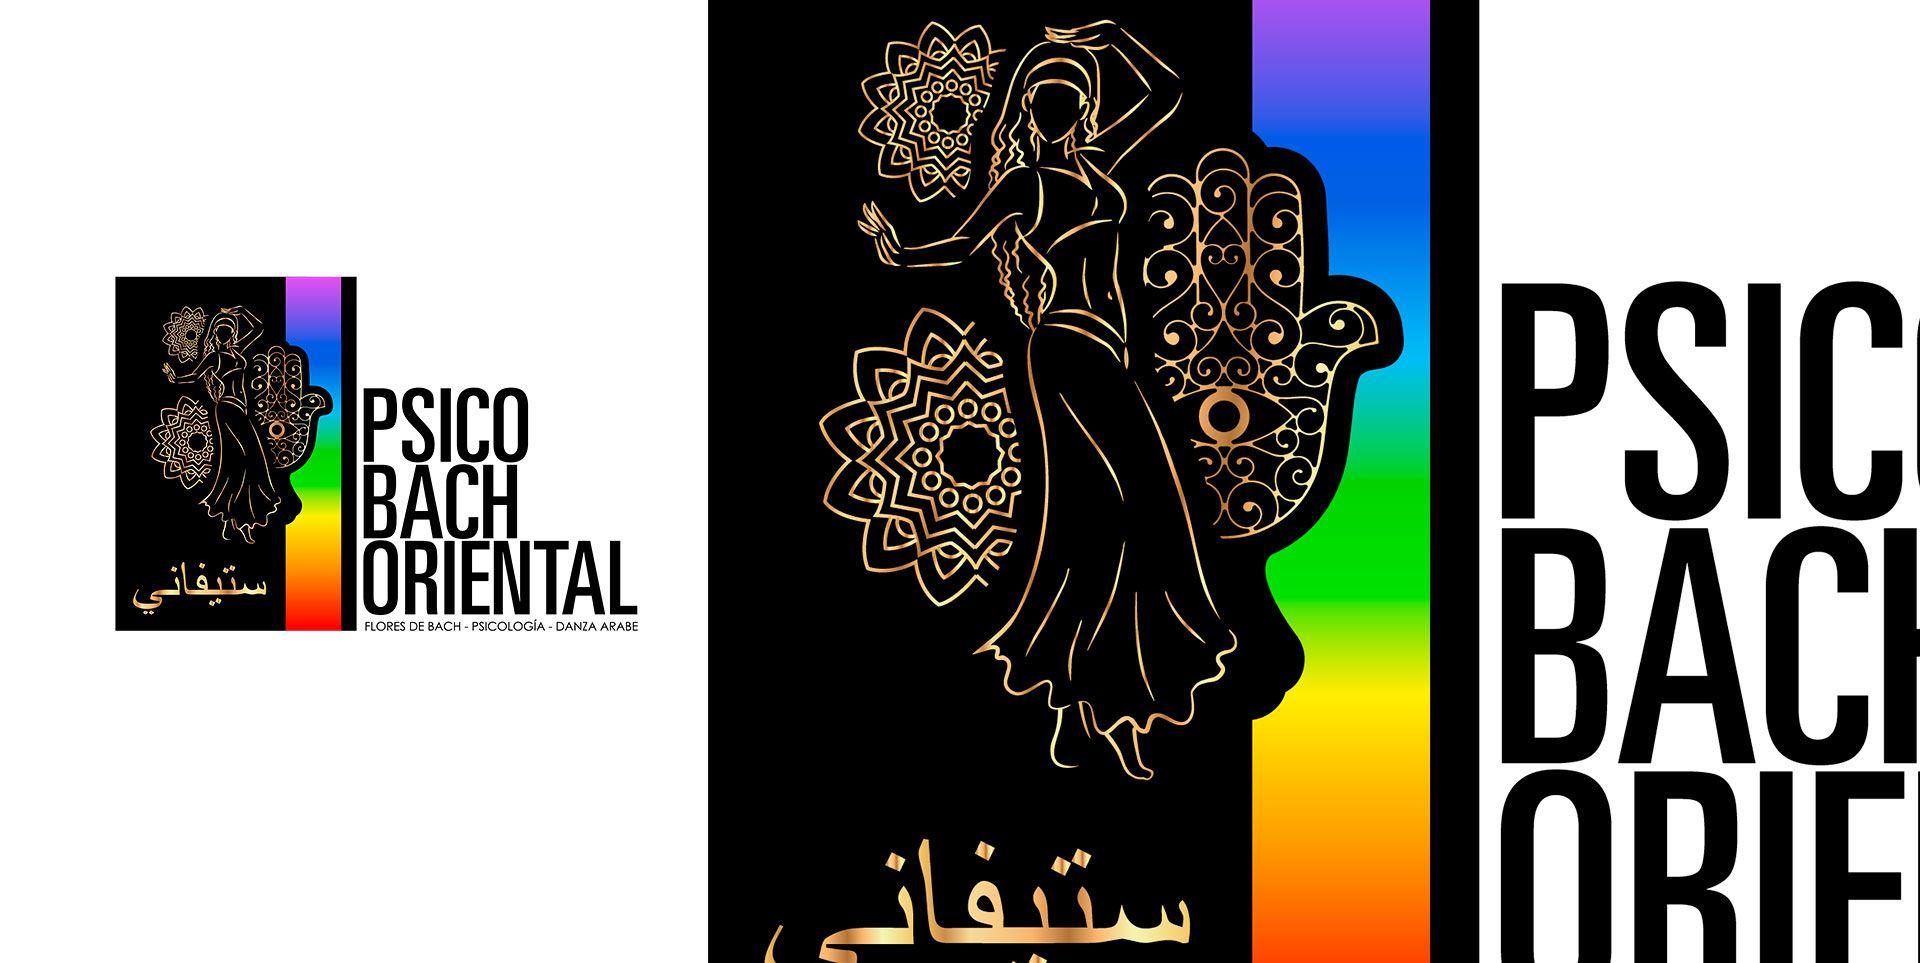 psico-bach-oriental-001